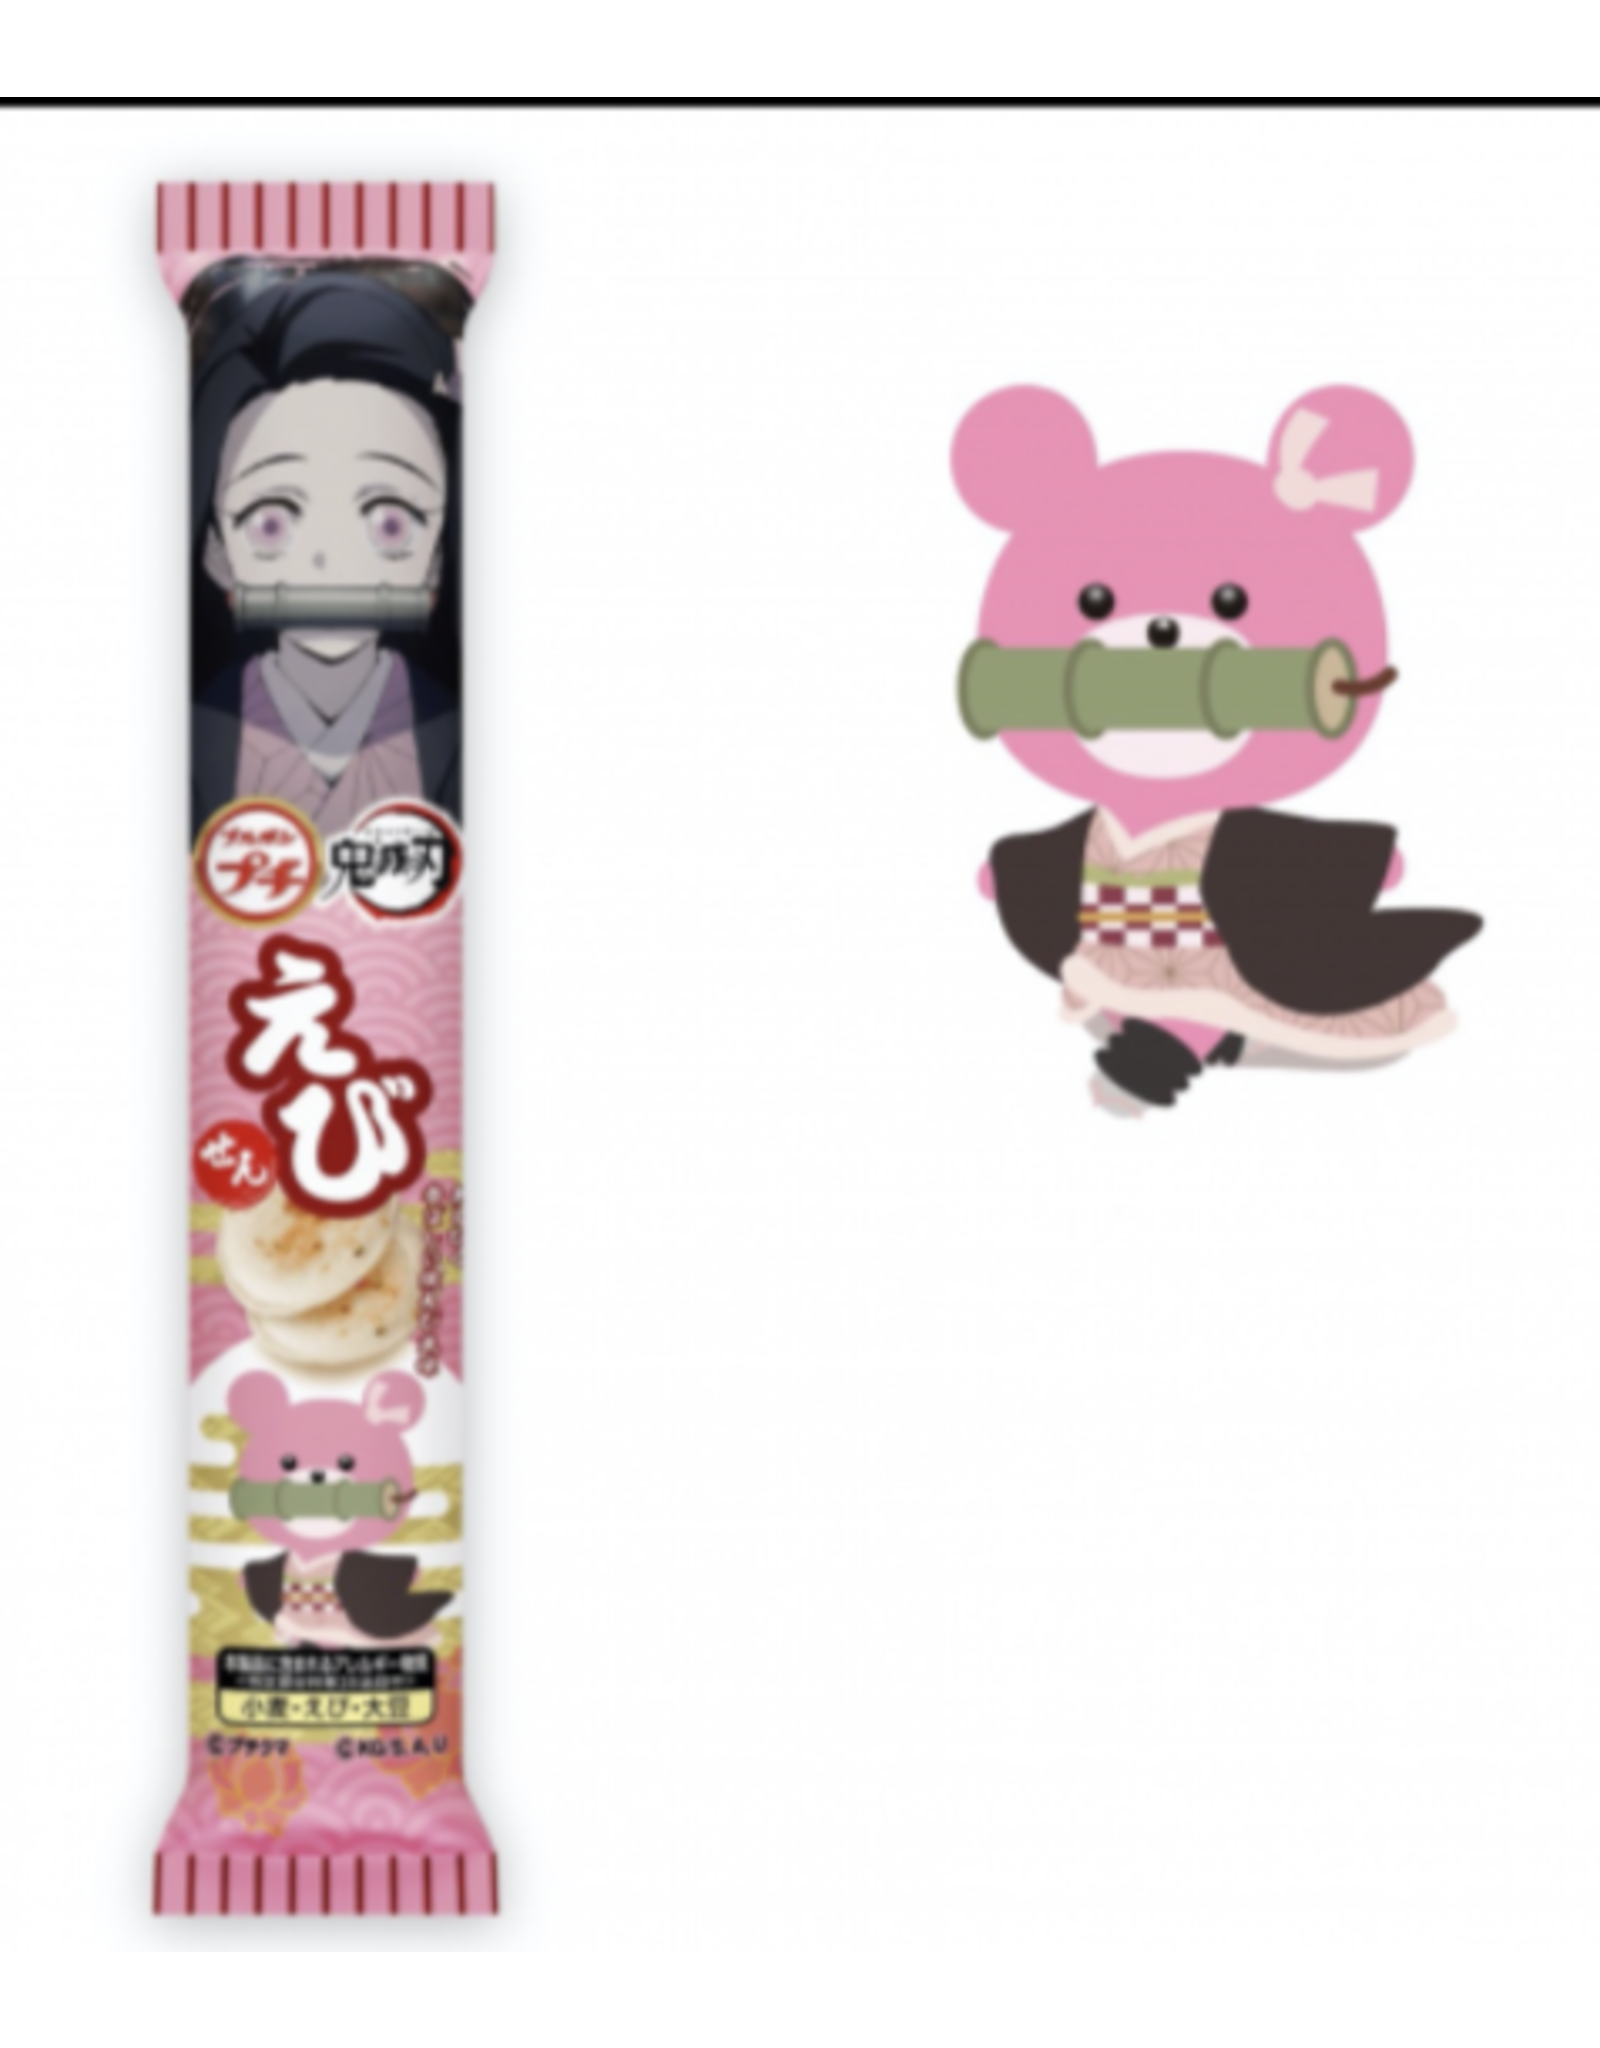 Bourbon Petit x Demon Slayer: Kimetsu no Yaiba - Nezuko - Shrimp Rice Crackers